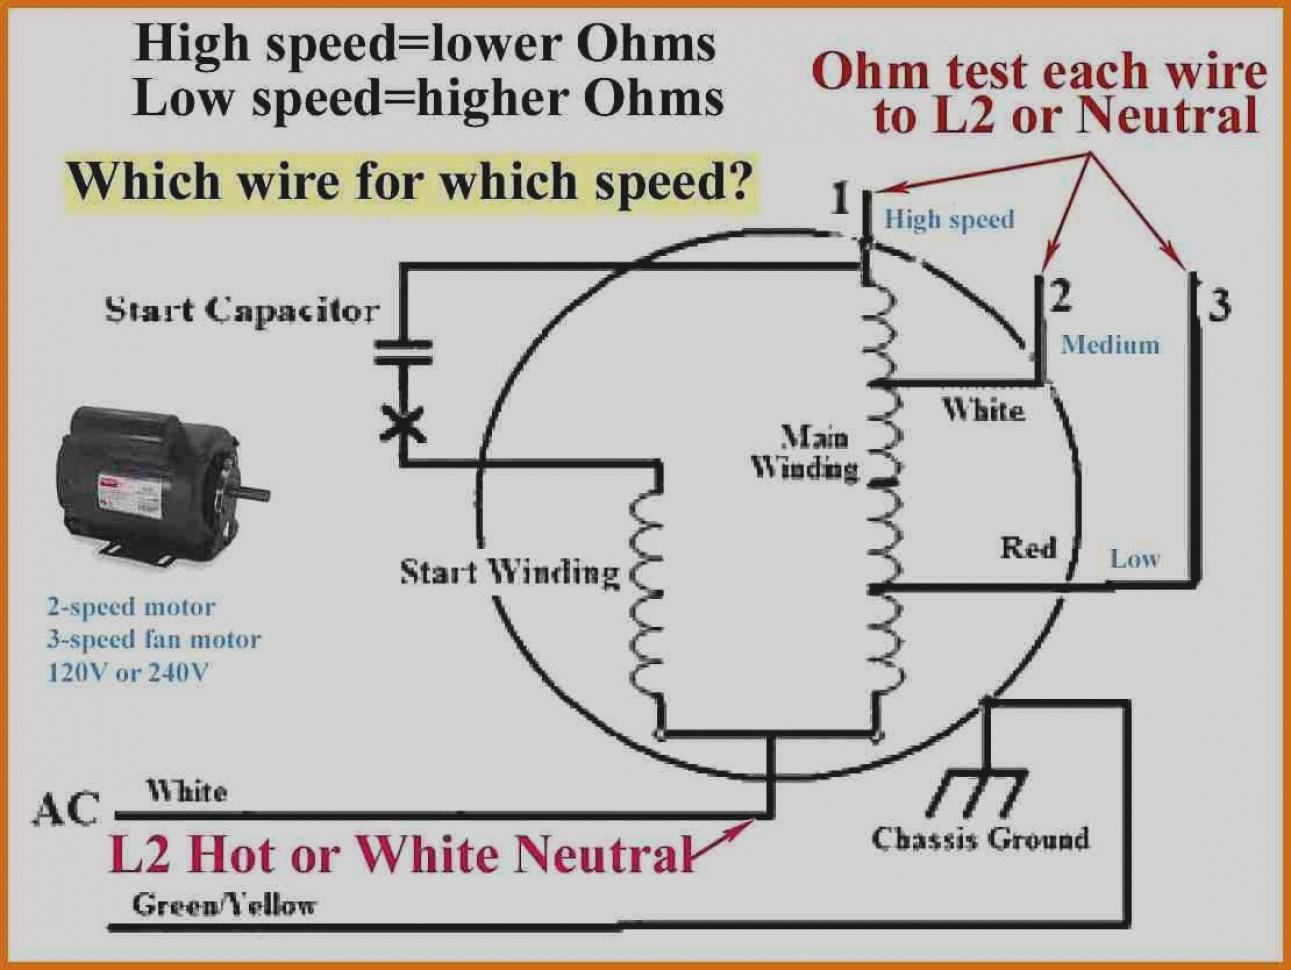 4 Wire 240V Schematic Diagram | Wiring Library - 4 Wire Motor Wiring Diagram